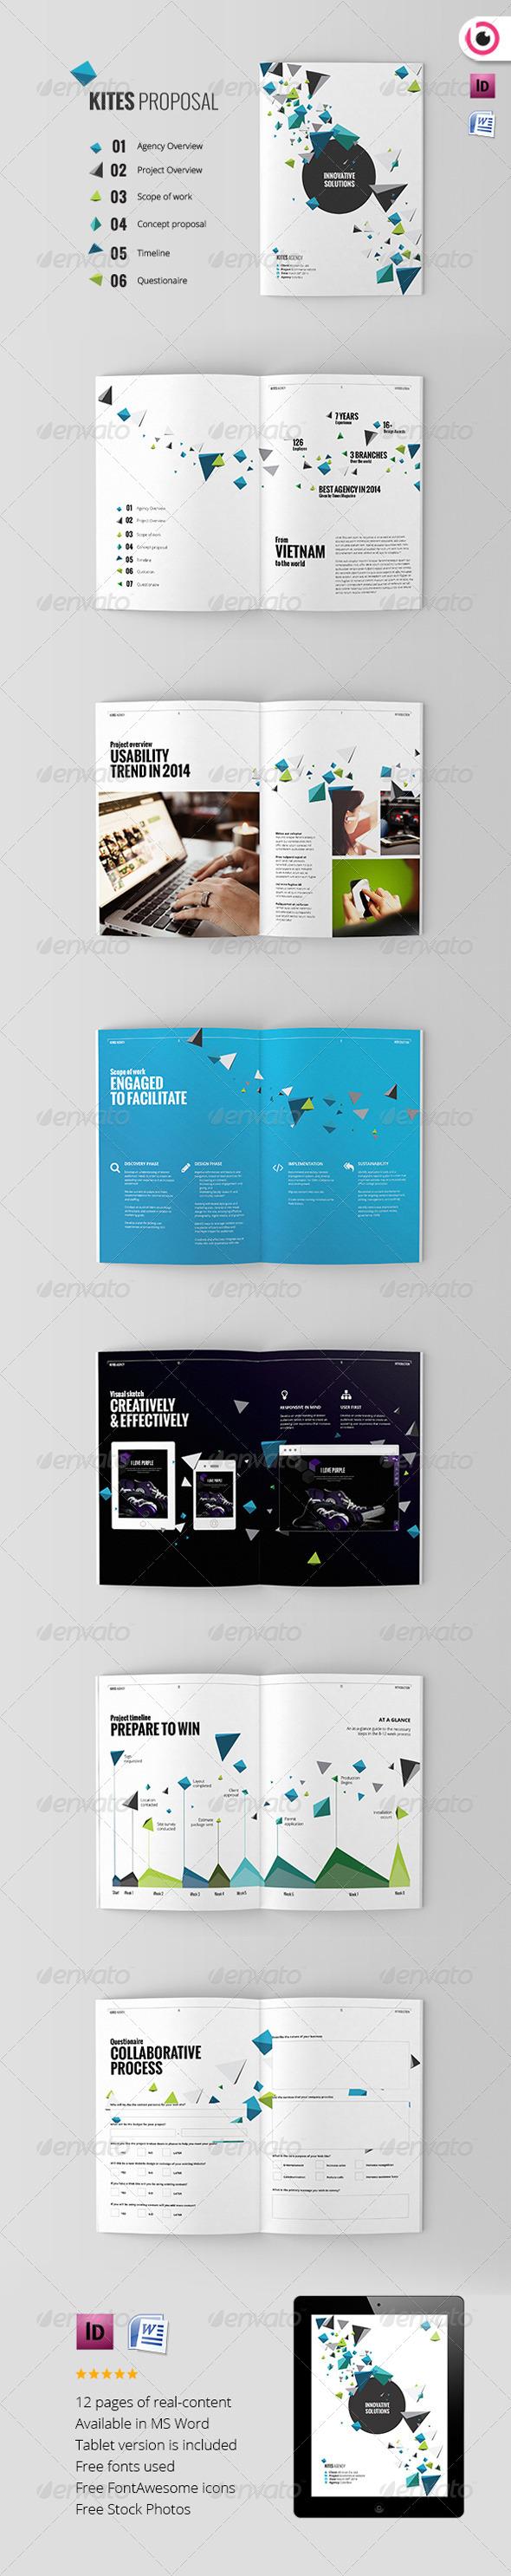 GraphicRiver Kites Unique Proposal Template 7955825